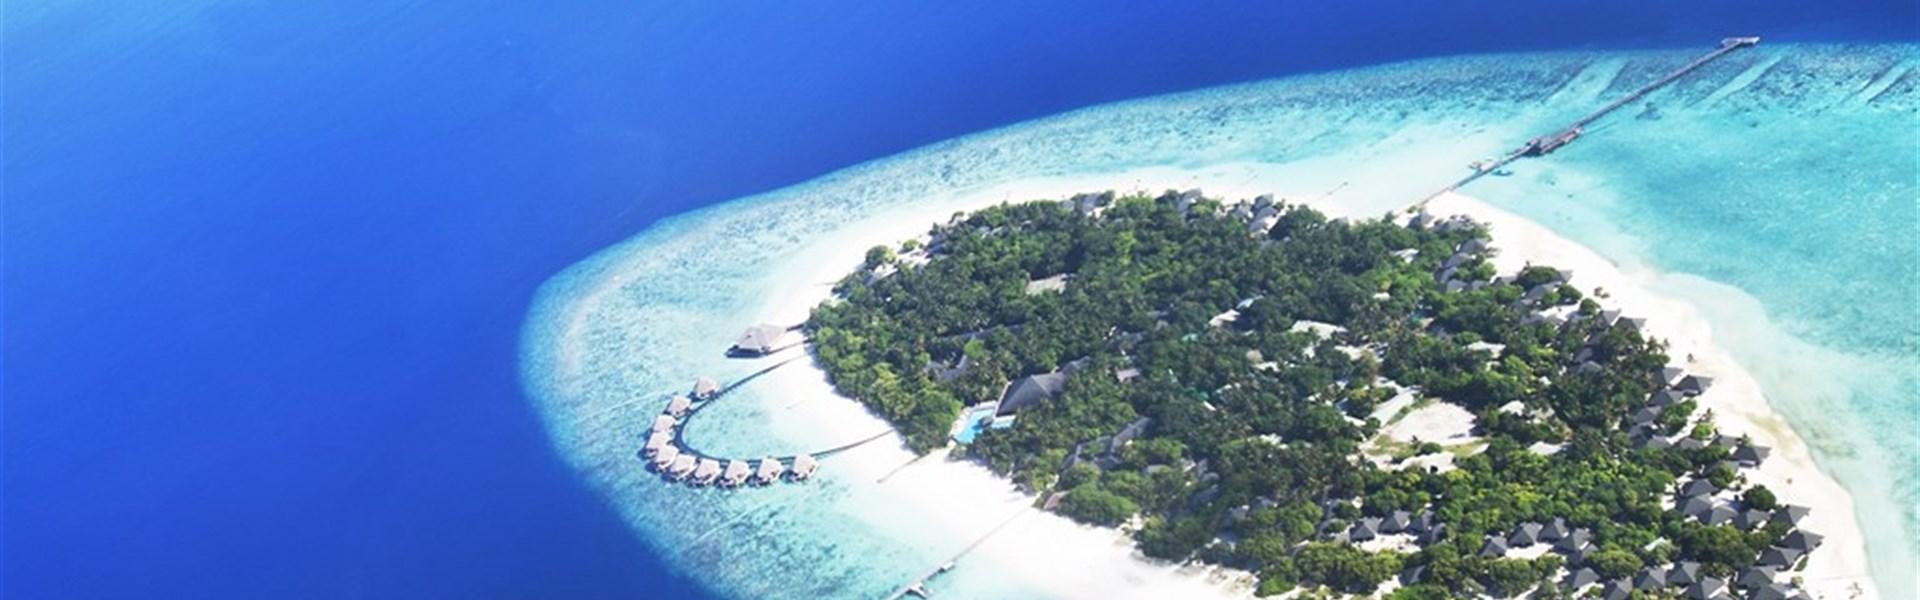 Marco Polo - Adaaran Select Meedhupparu - adaaran select meedhupparu_pohled z dronu